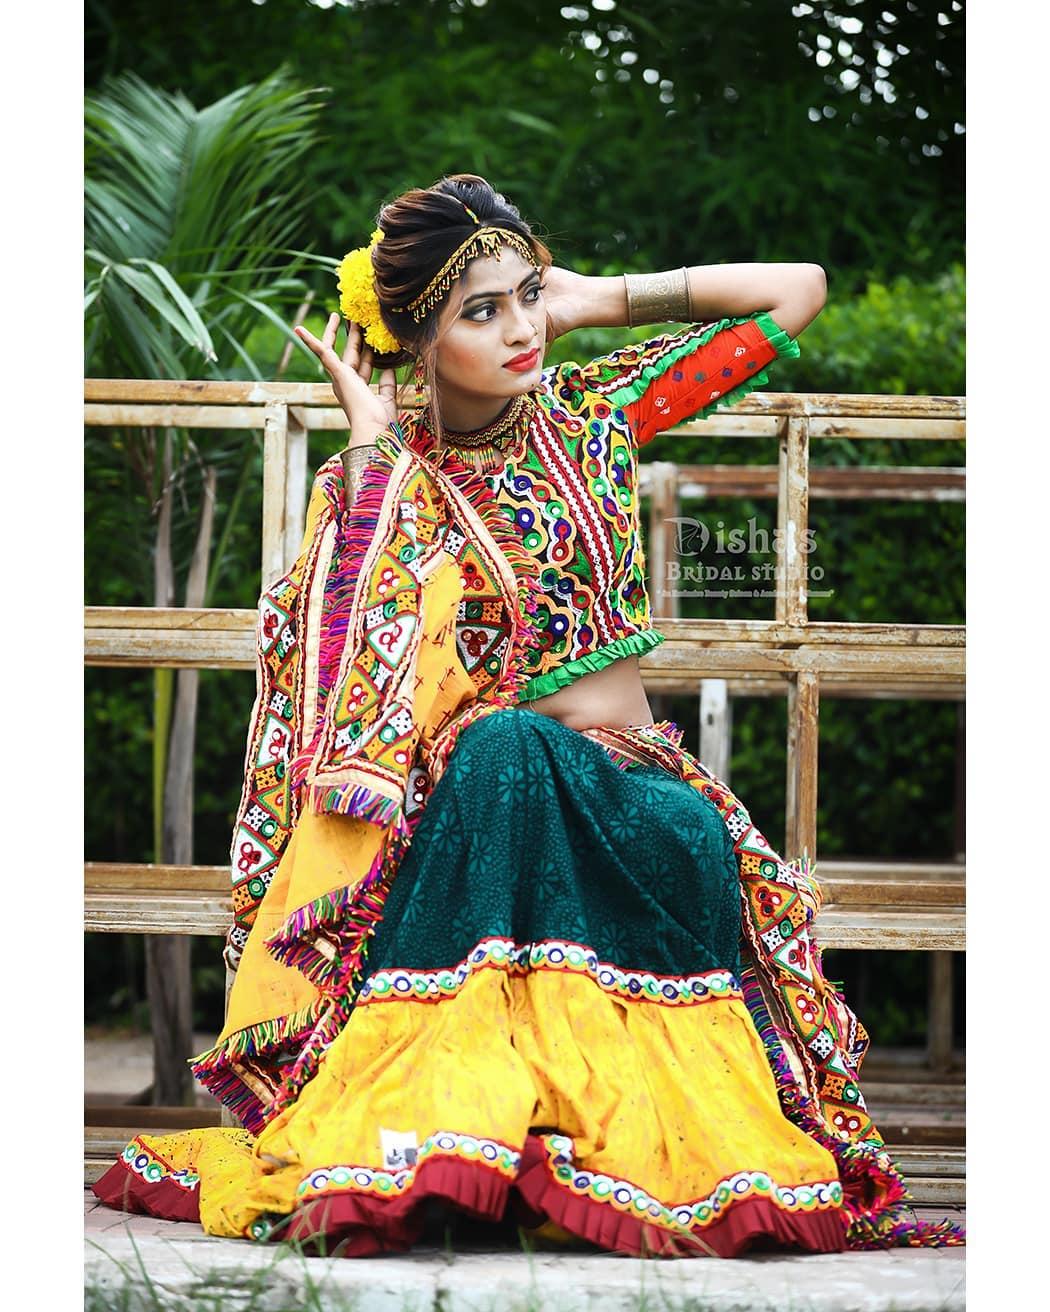 #navratri2019 #navratri #navratri2k19  shoot.. . . MUA: @dishabeautysaloonacademynikol  Shoot: @dip_memento_photography @meandmyphotography11  InFrame: @patelshefali0806  Costume by: @rashmithummar Jewellery : @dishapanchal246  #photoshoot #ethnic #traditionalart #ahmedabad #gujarati  #pop #makeup #navratrichaniyacholi #chaniyacholi #indianfashionblogger  #fashionblogger #makeuptutorial #weddingdress #sexy#instagram #instapic #bollywood #bollywoodhotness #bollywoodactresses #indian #pic #picoftheday #photooftheday ##instagood#instamood #festivalofnations #festival